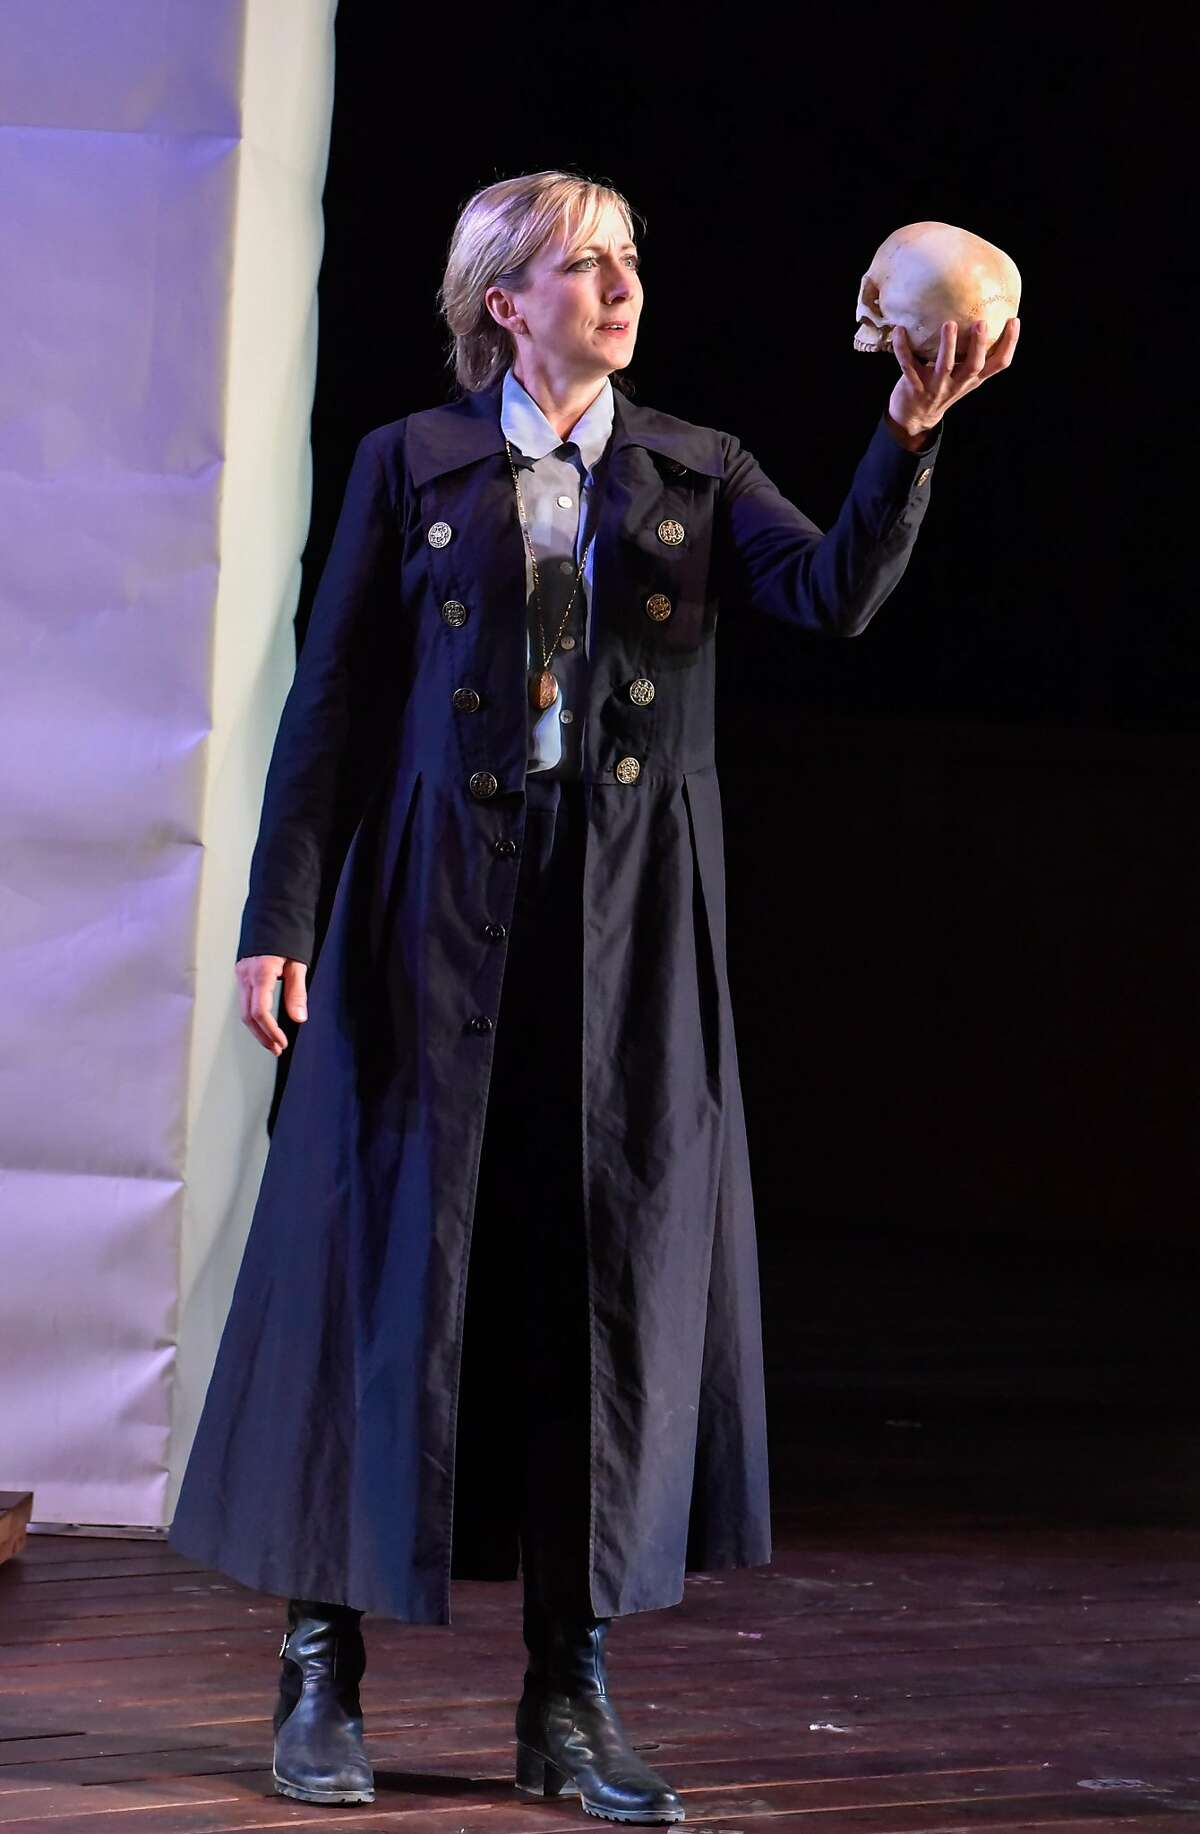 Hamlet (Kate Eastwood Norris)�laments the loss of Yorick.